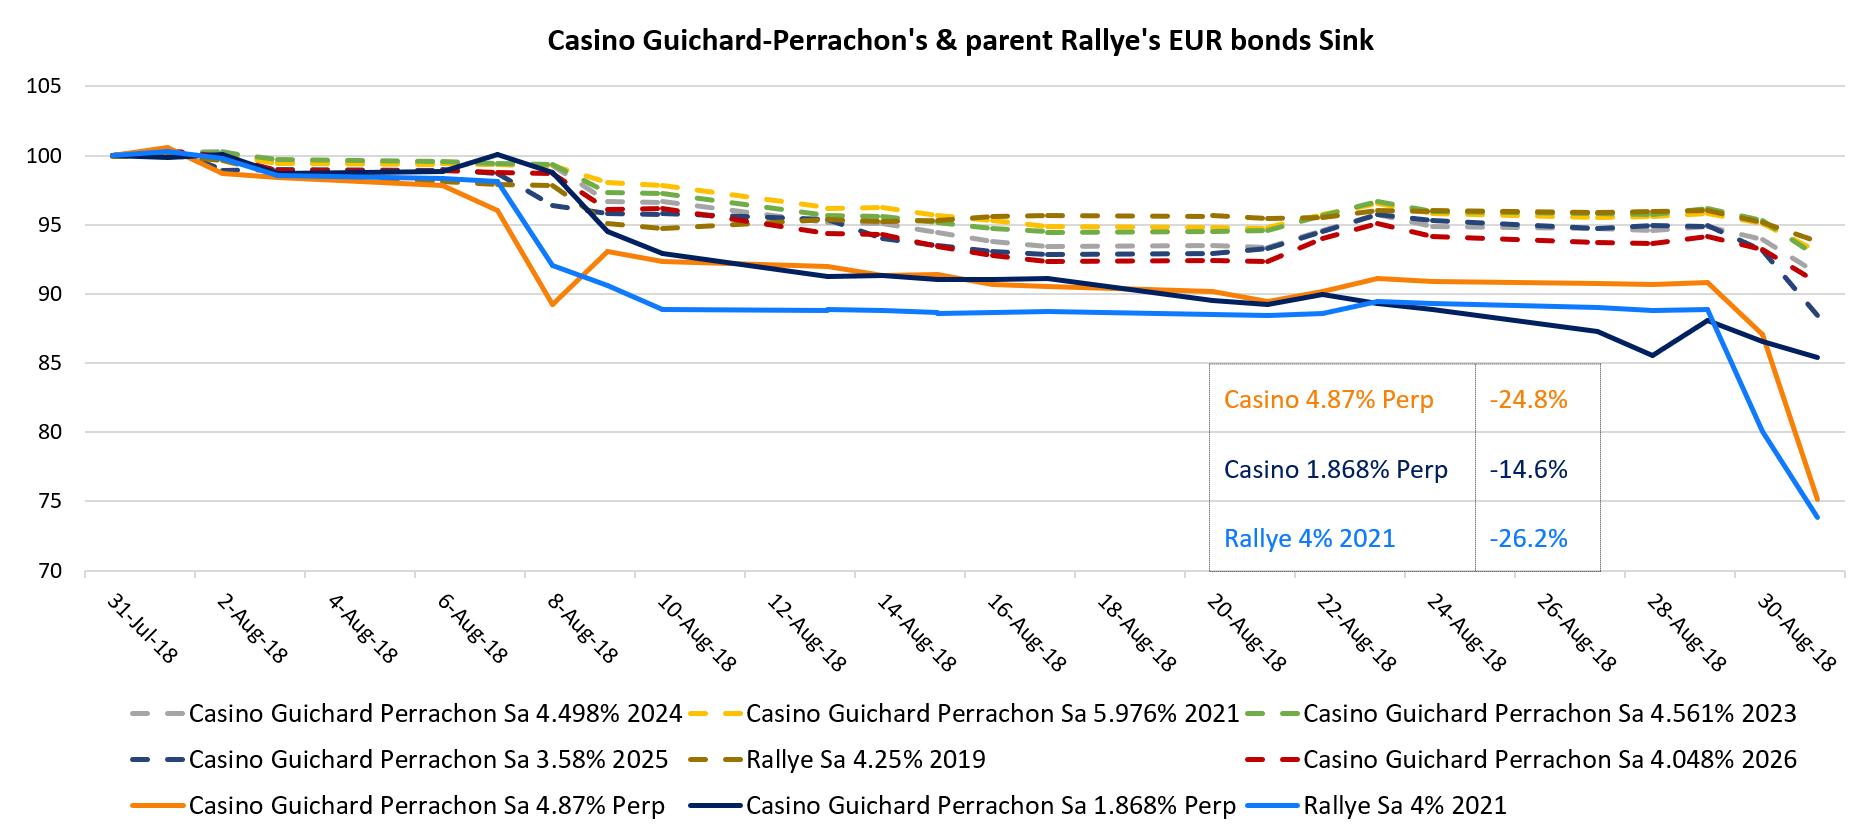 Casino Guichard-Perrachon Bonds